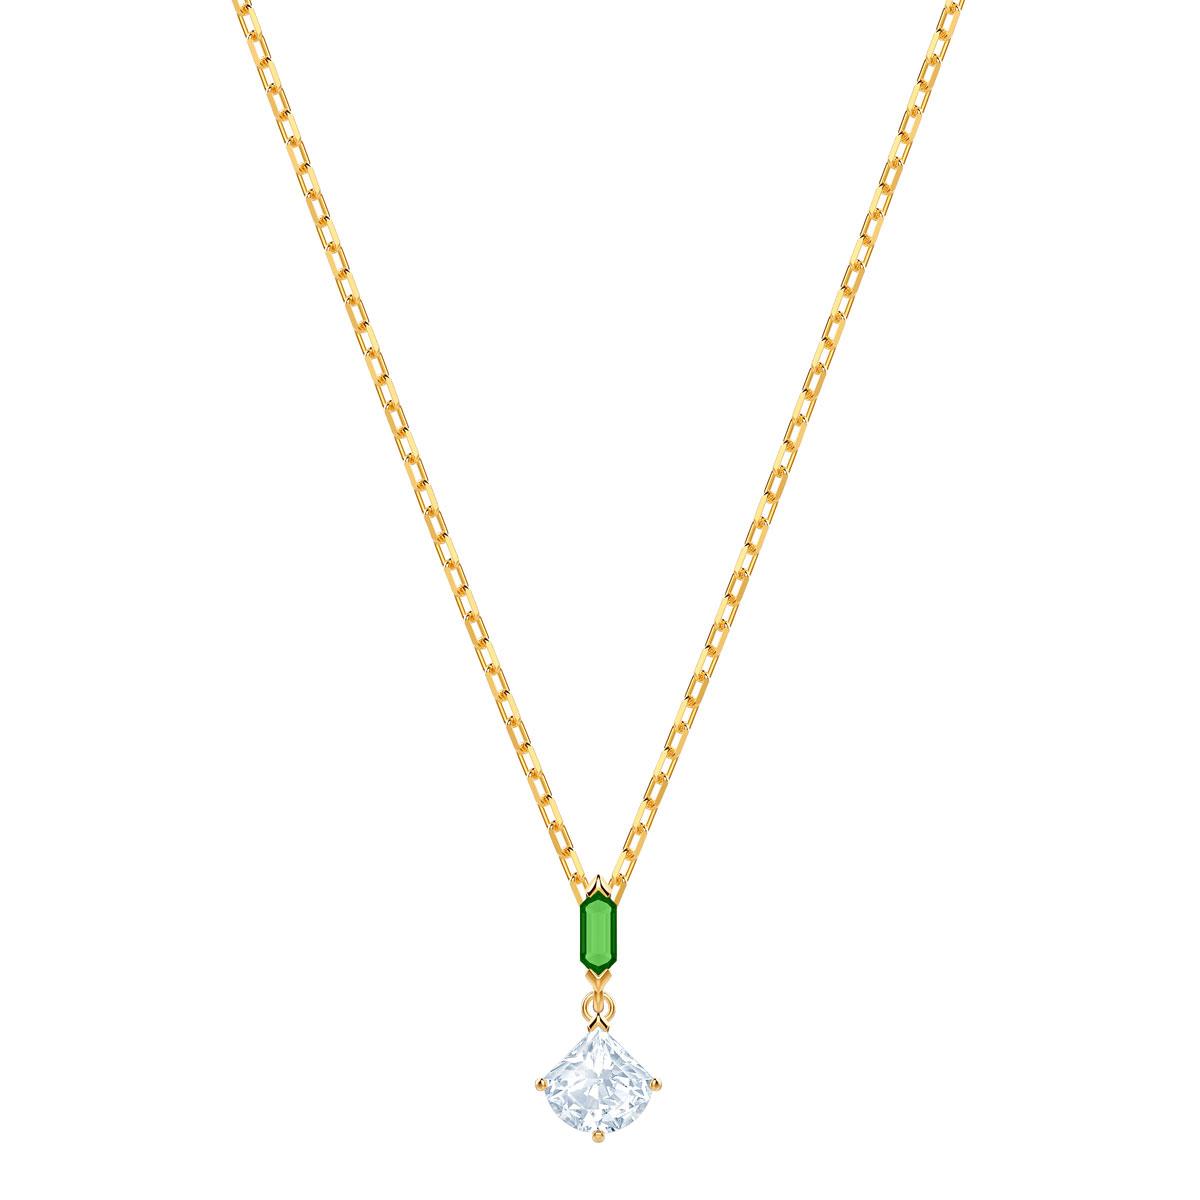 Swarovski Crystal and Gold Oz Pendant Necklace